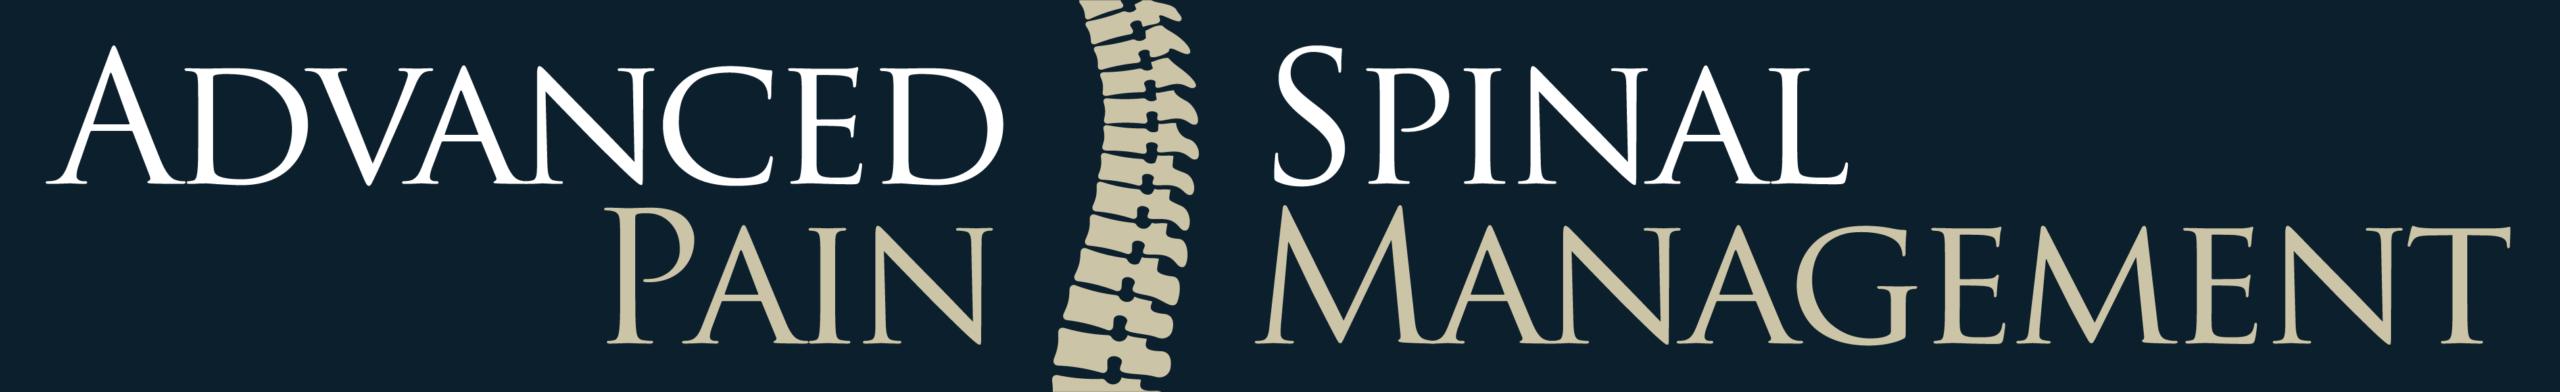 ASPM   Advanced Spinal Pain Management